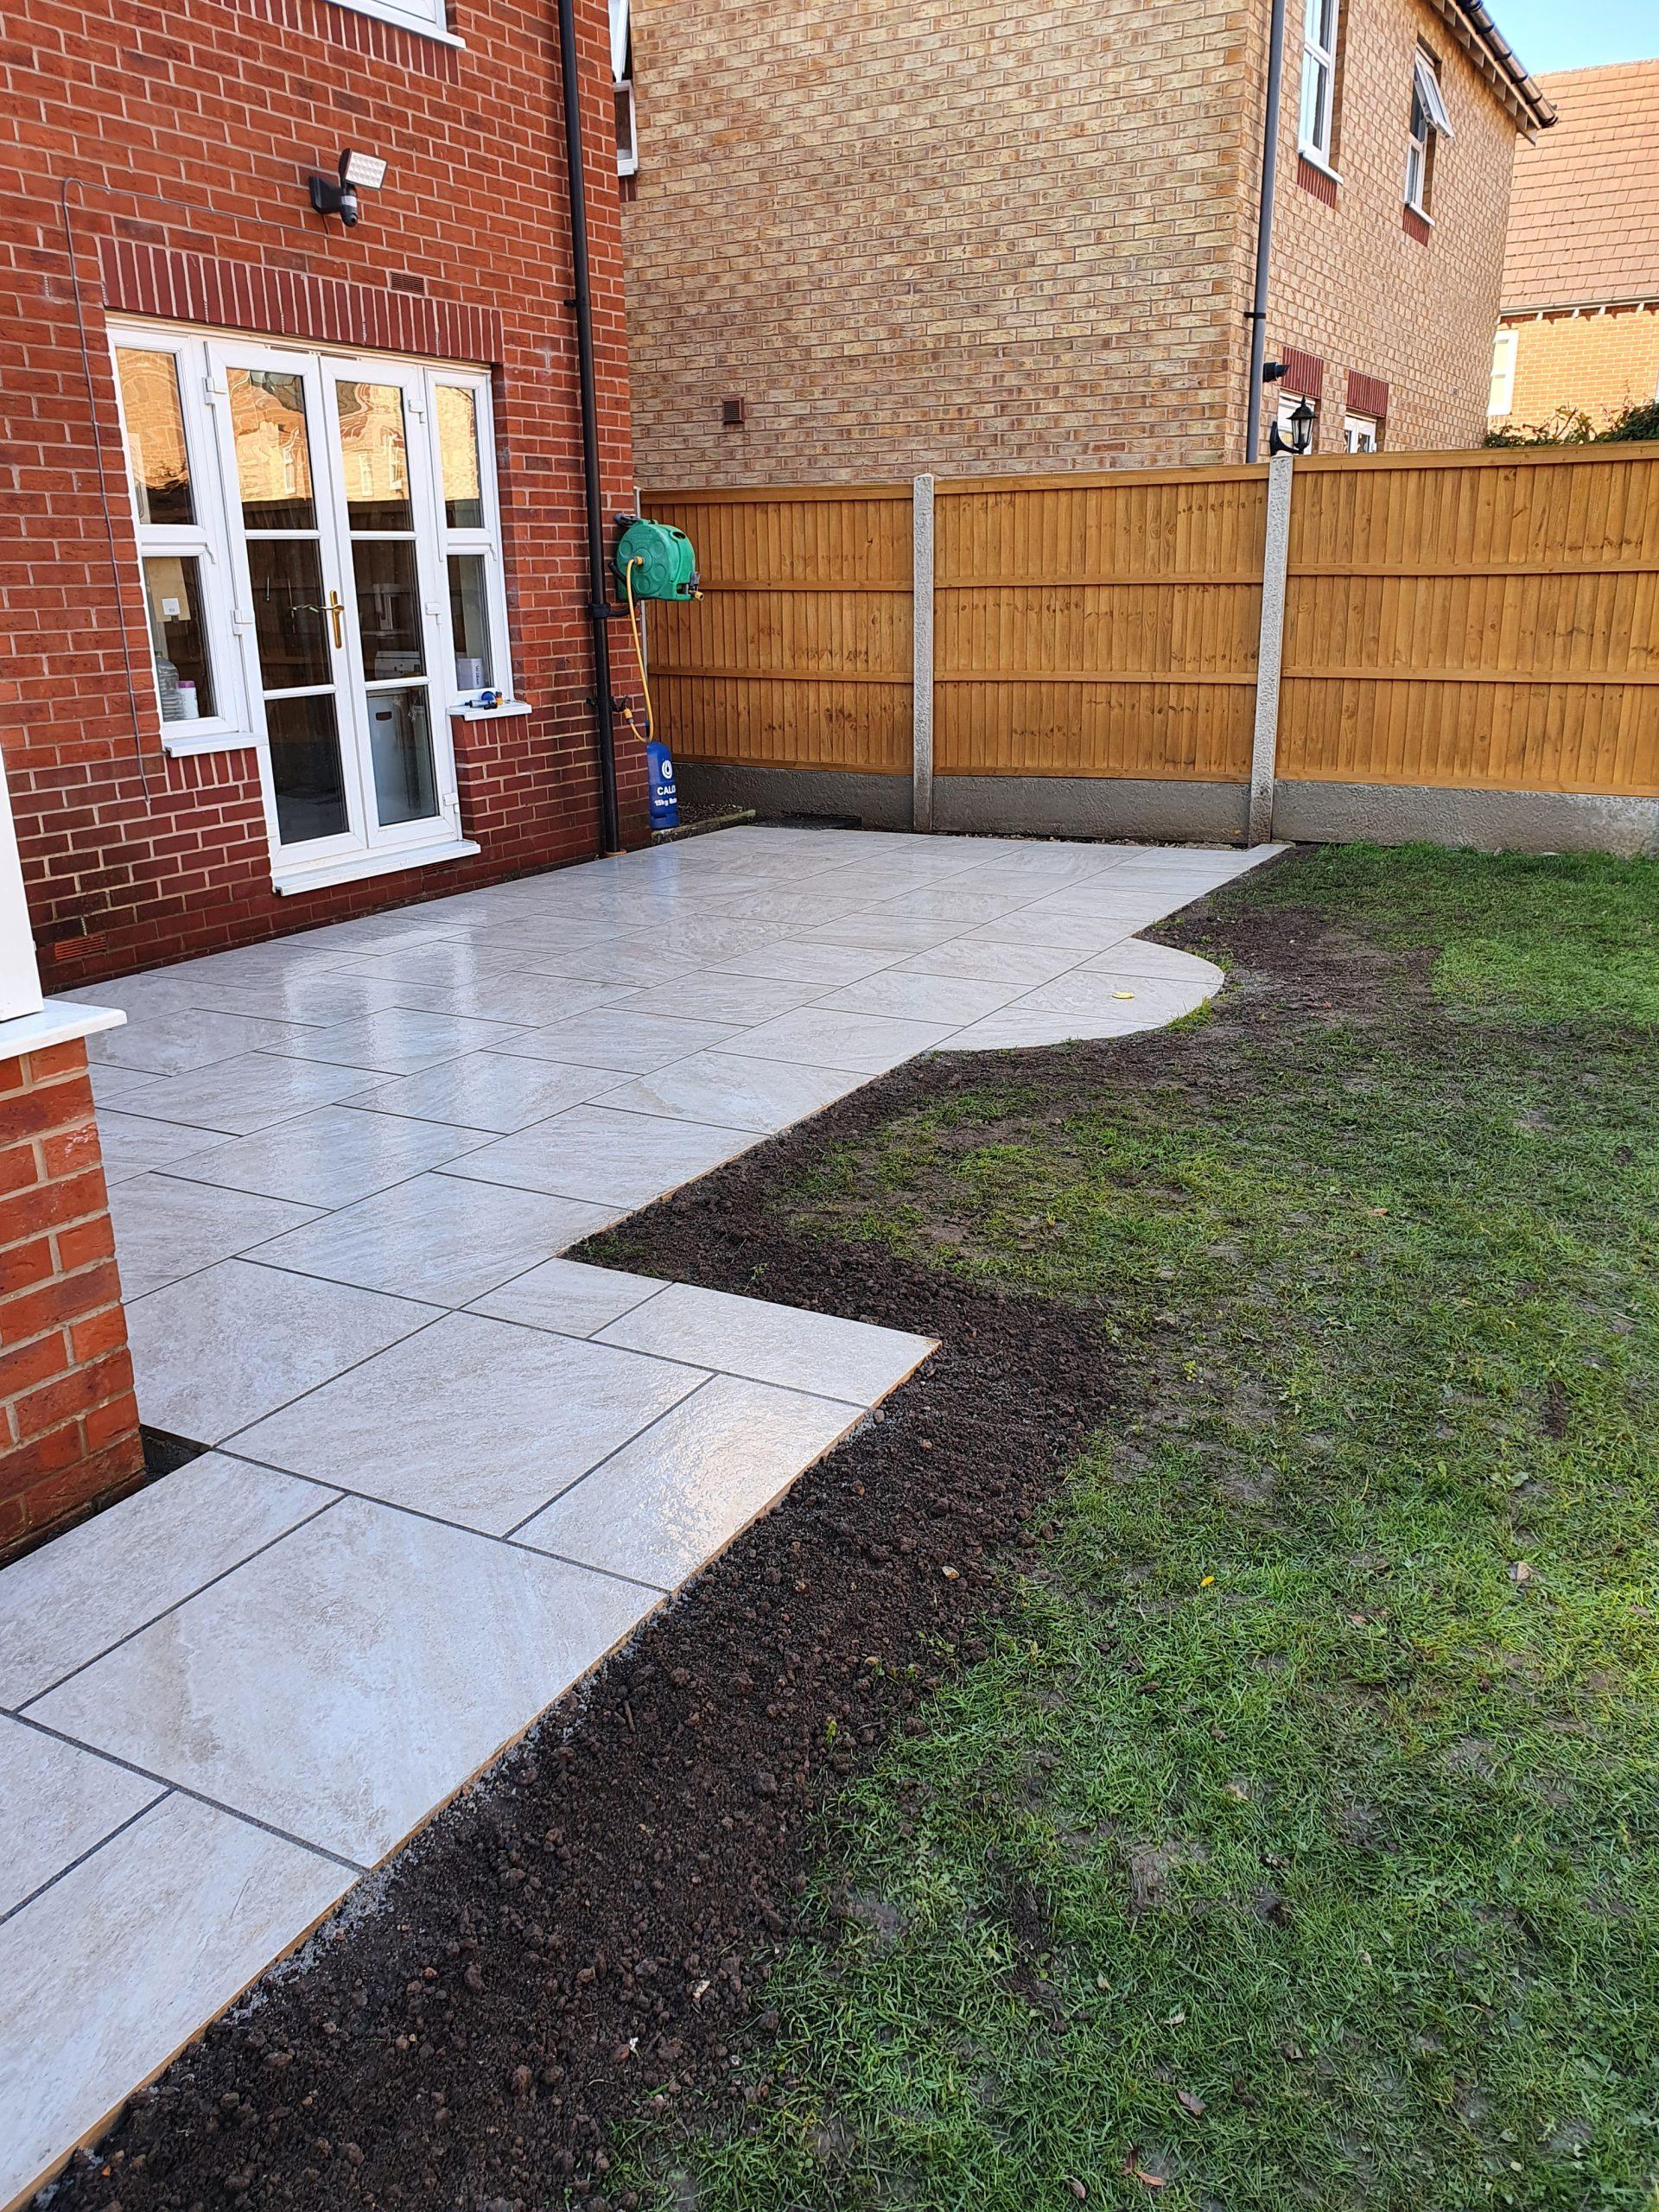 shaped patio area